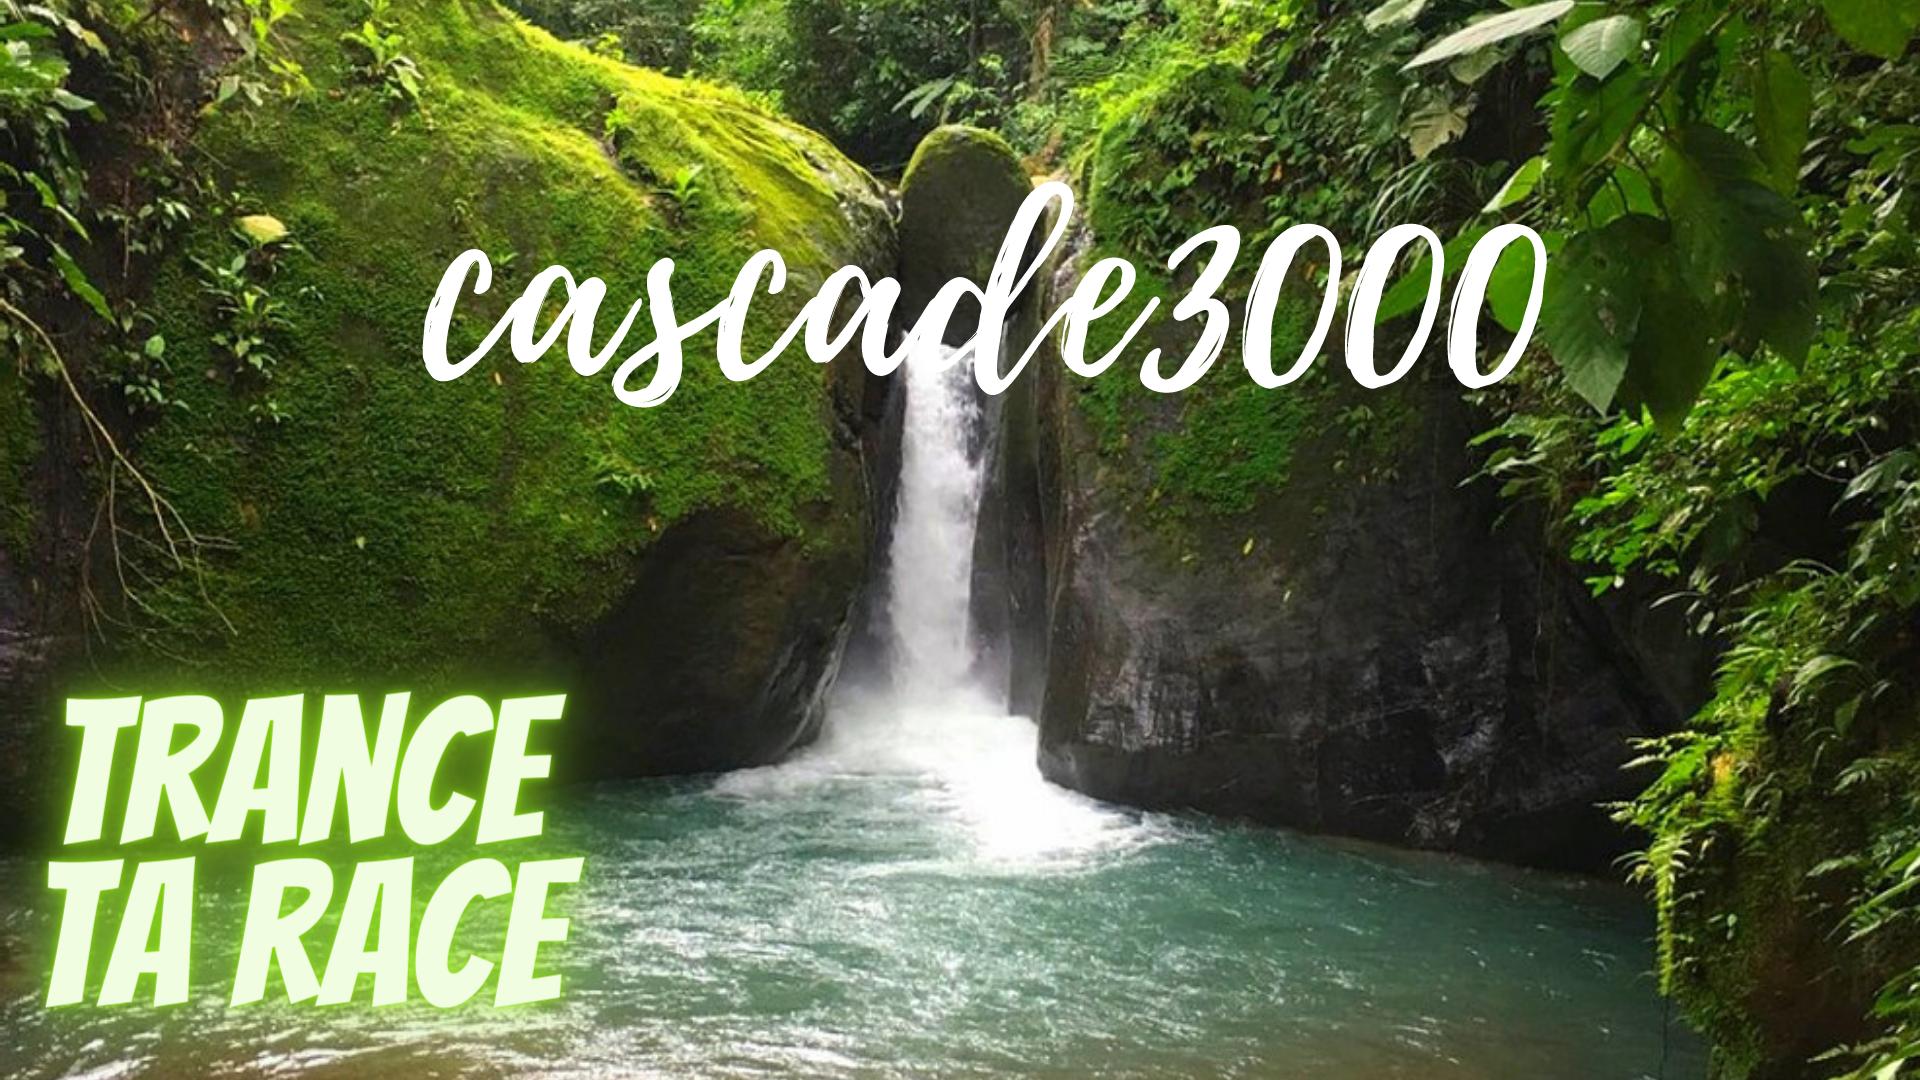 trance ta race : Cascade 3000